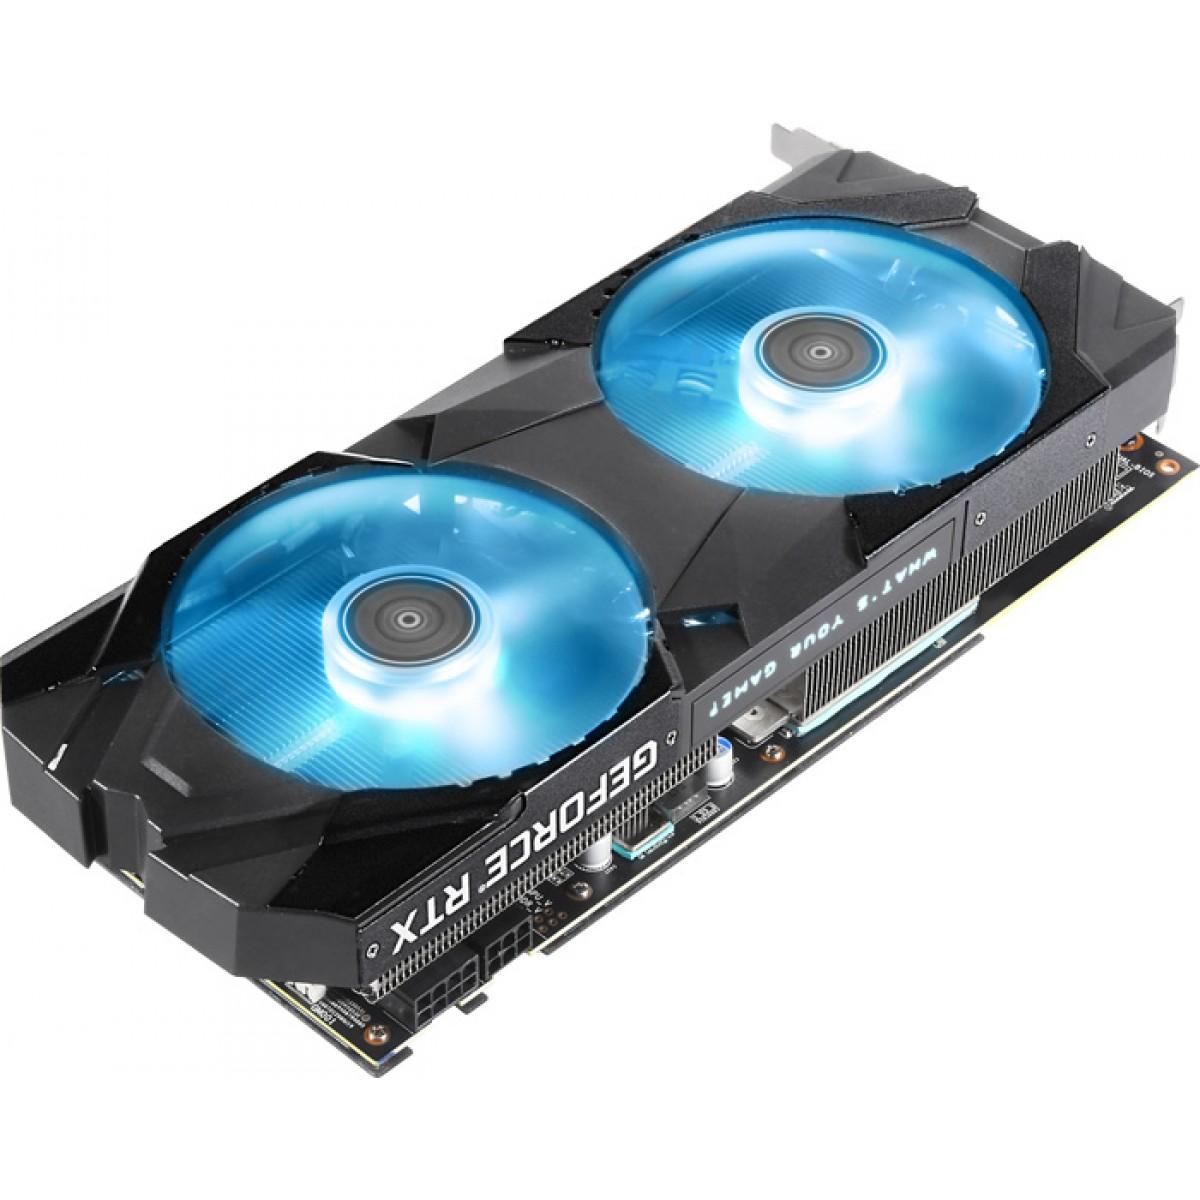 Placa de Vídeo Galax GeForce RTX 2070 Super EX (1-Click OC), 8GB GDDR6, 256Bit, 27ISL6MDU9EX